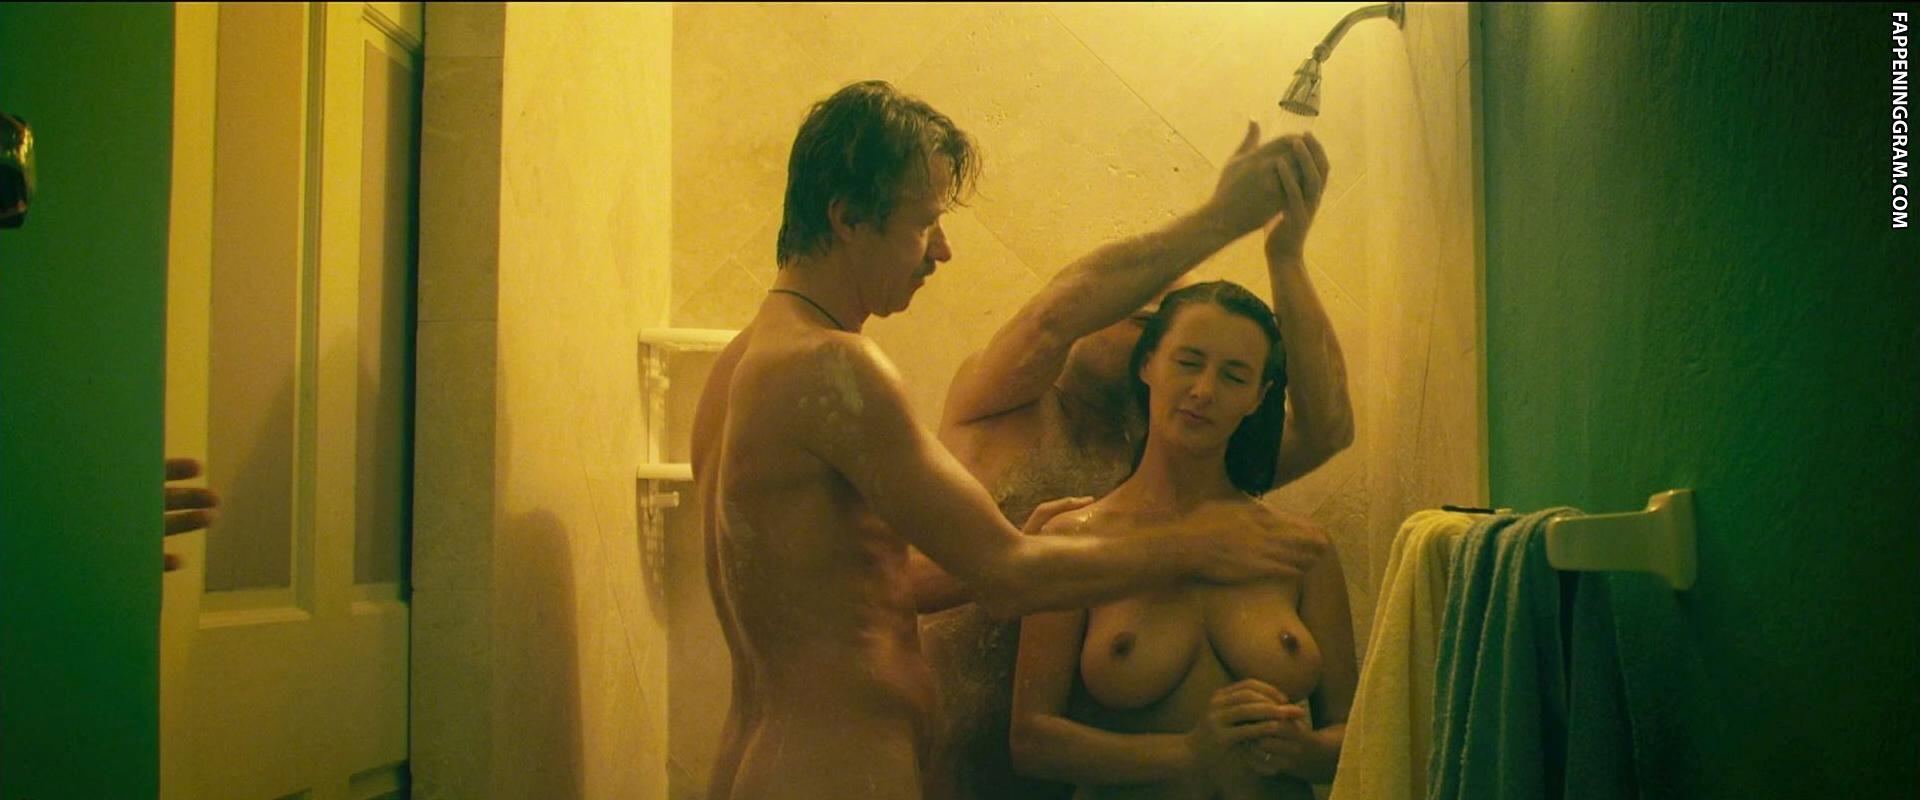 Viktorie Cermáková Nude